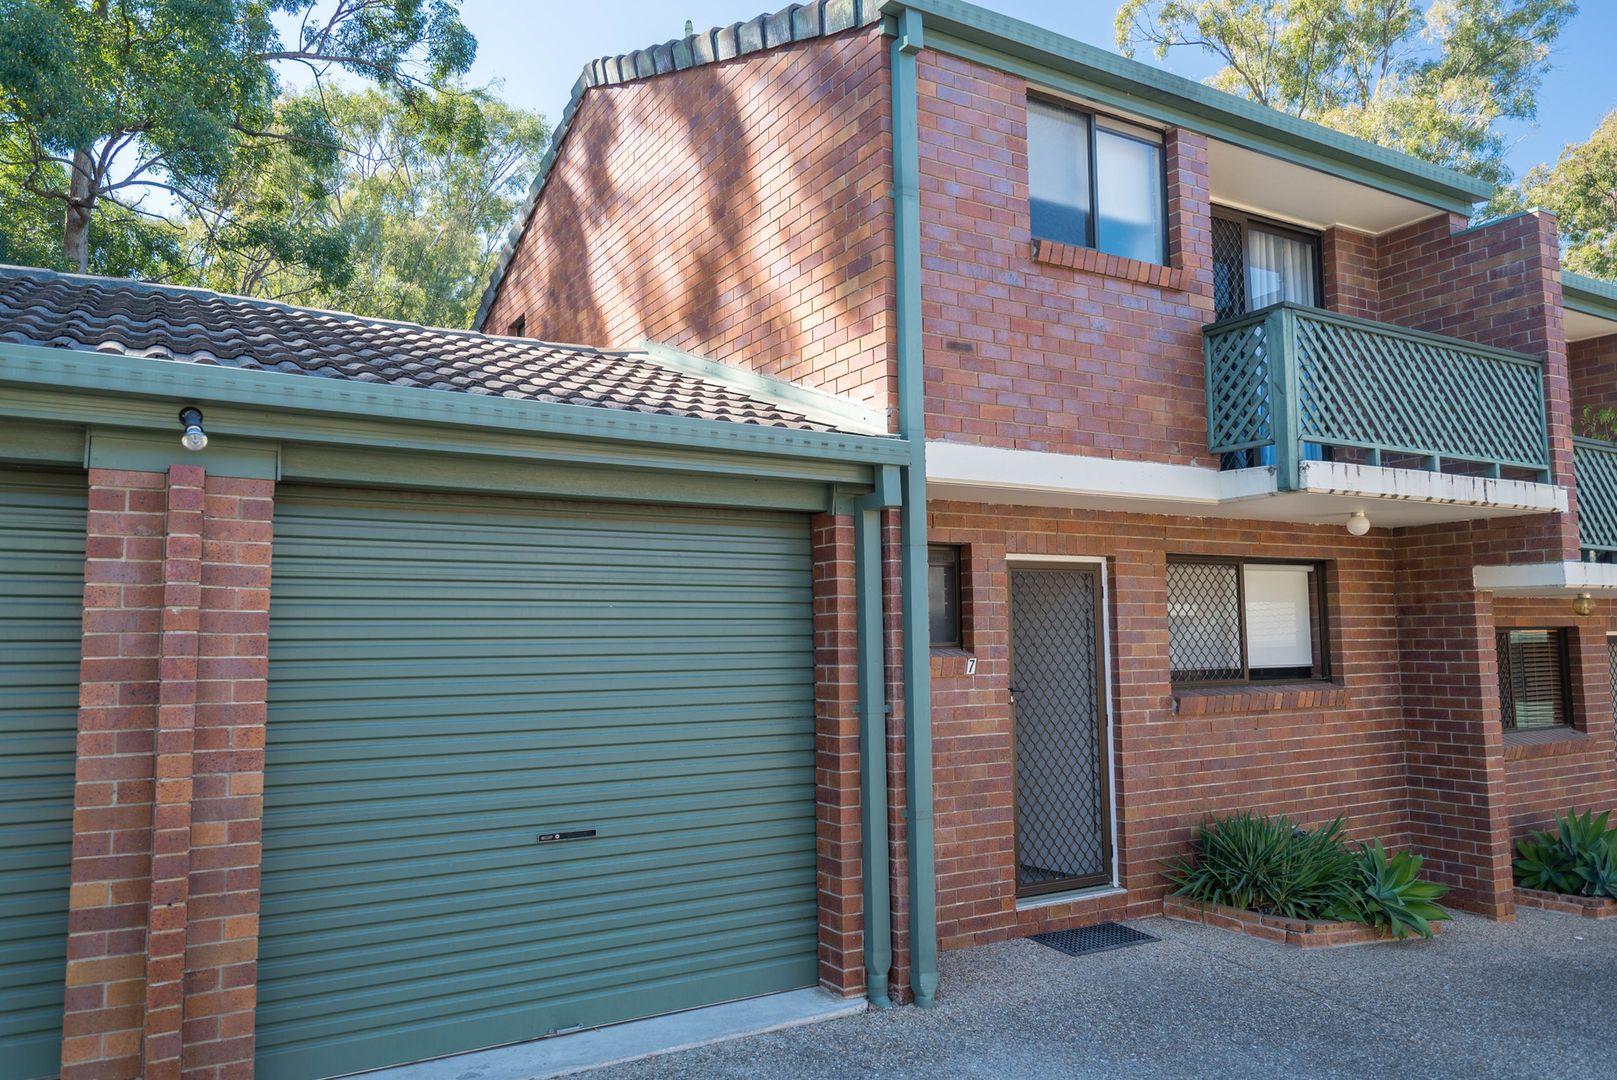 7/66 Moran Street, Alderley QLD 4051, Image 0